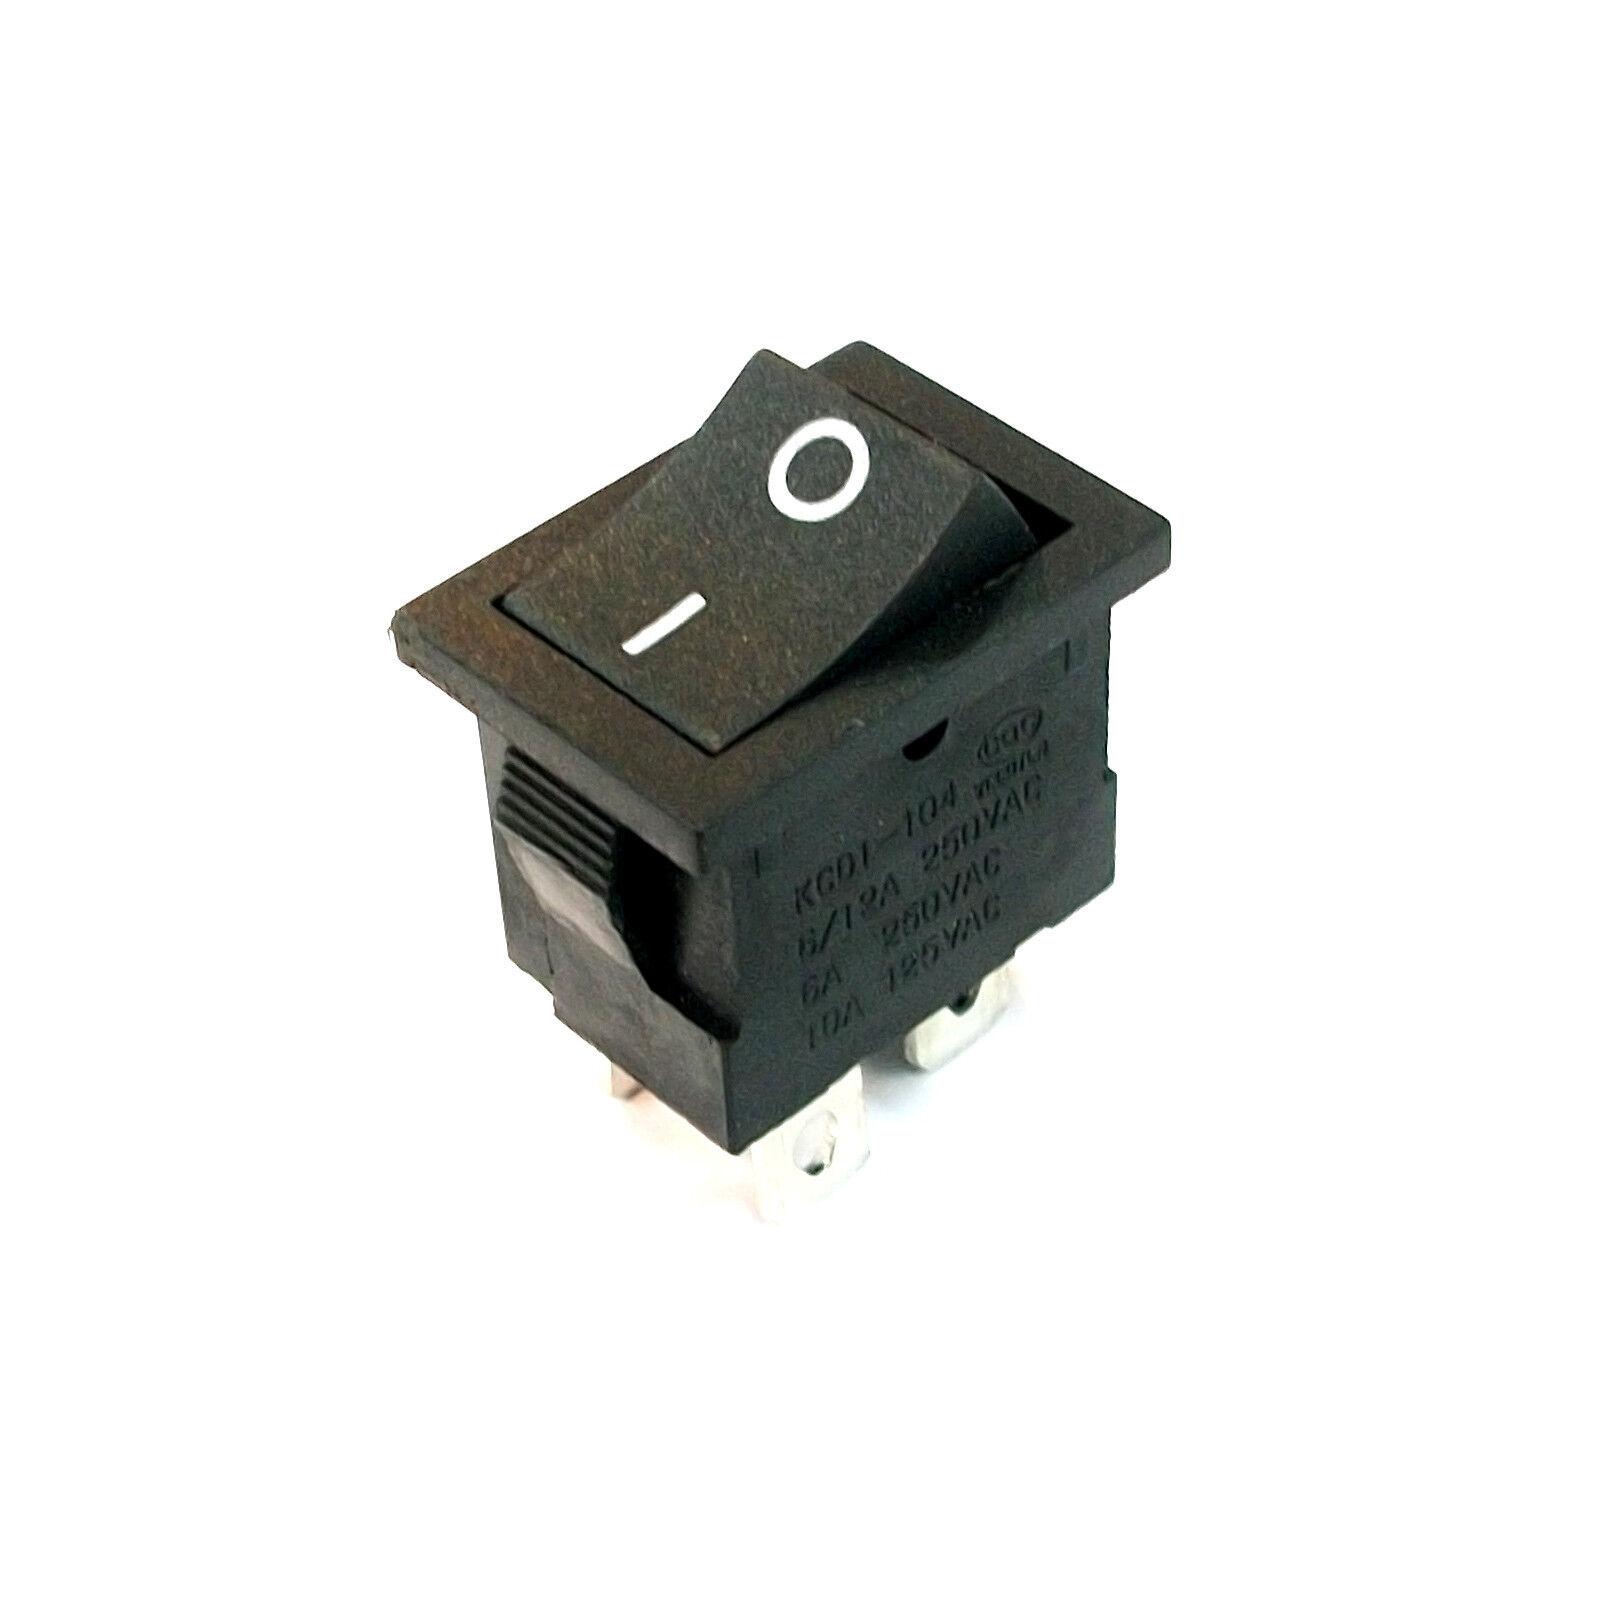 1 X 21mm 4 Pin DPST On/off Boat Car Rocker Switch Kcd1-104n Black ...